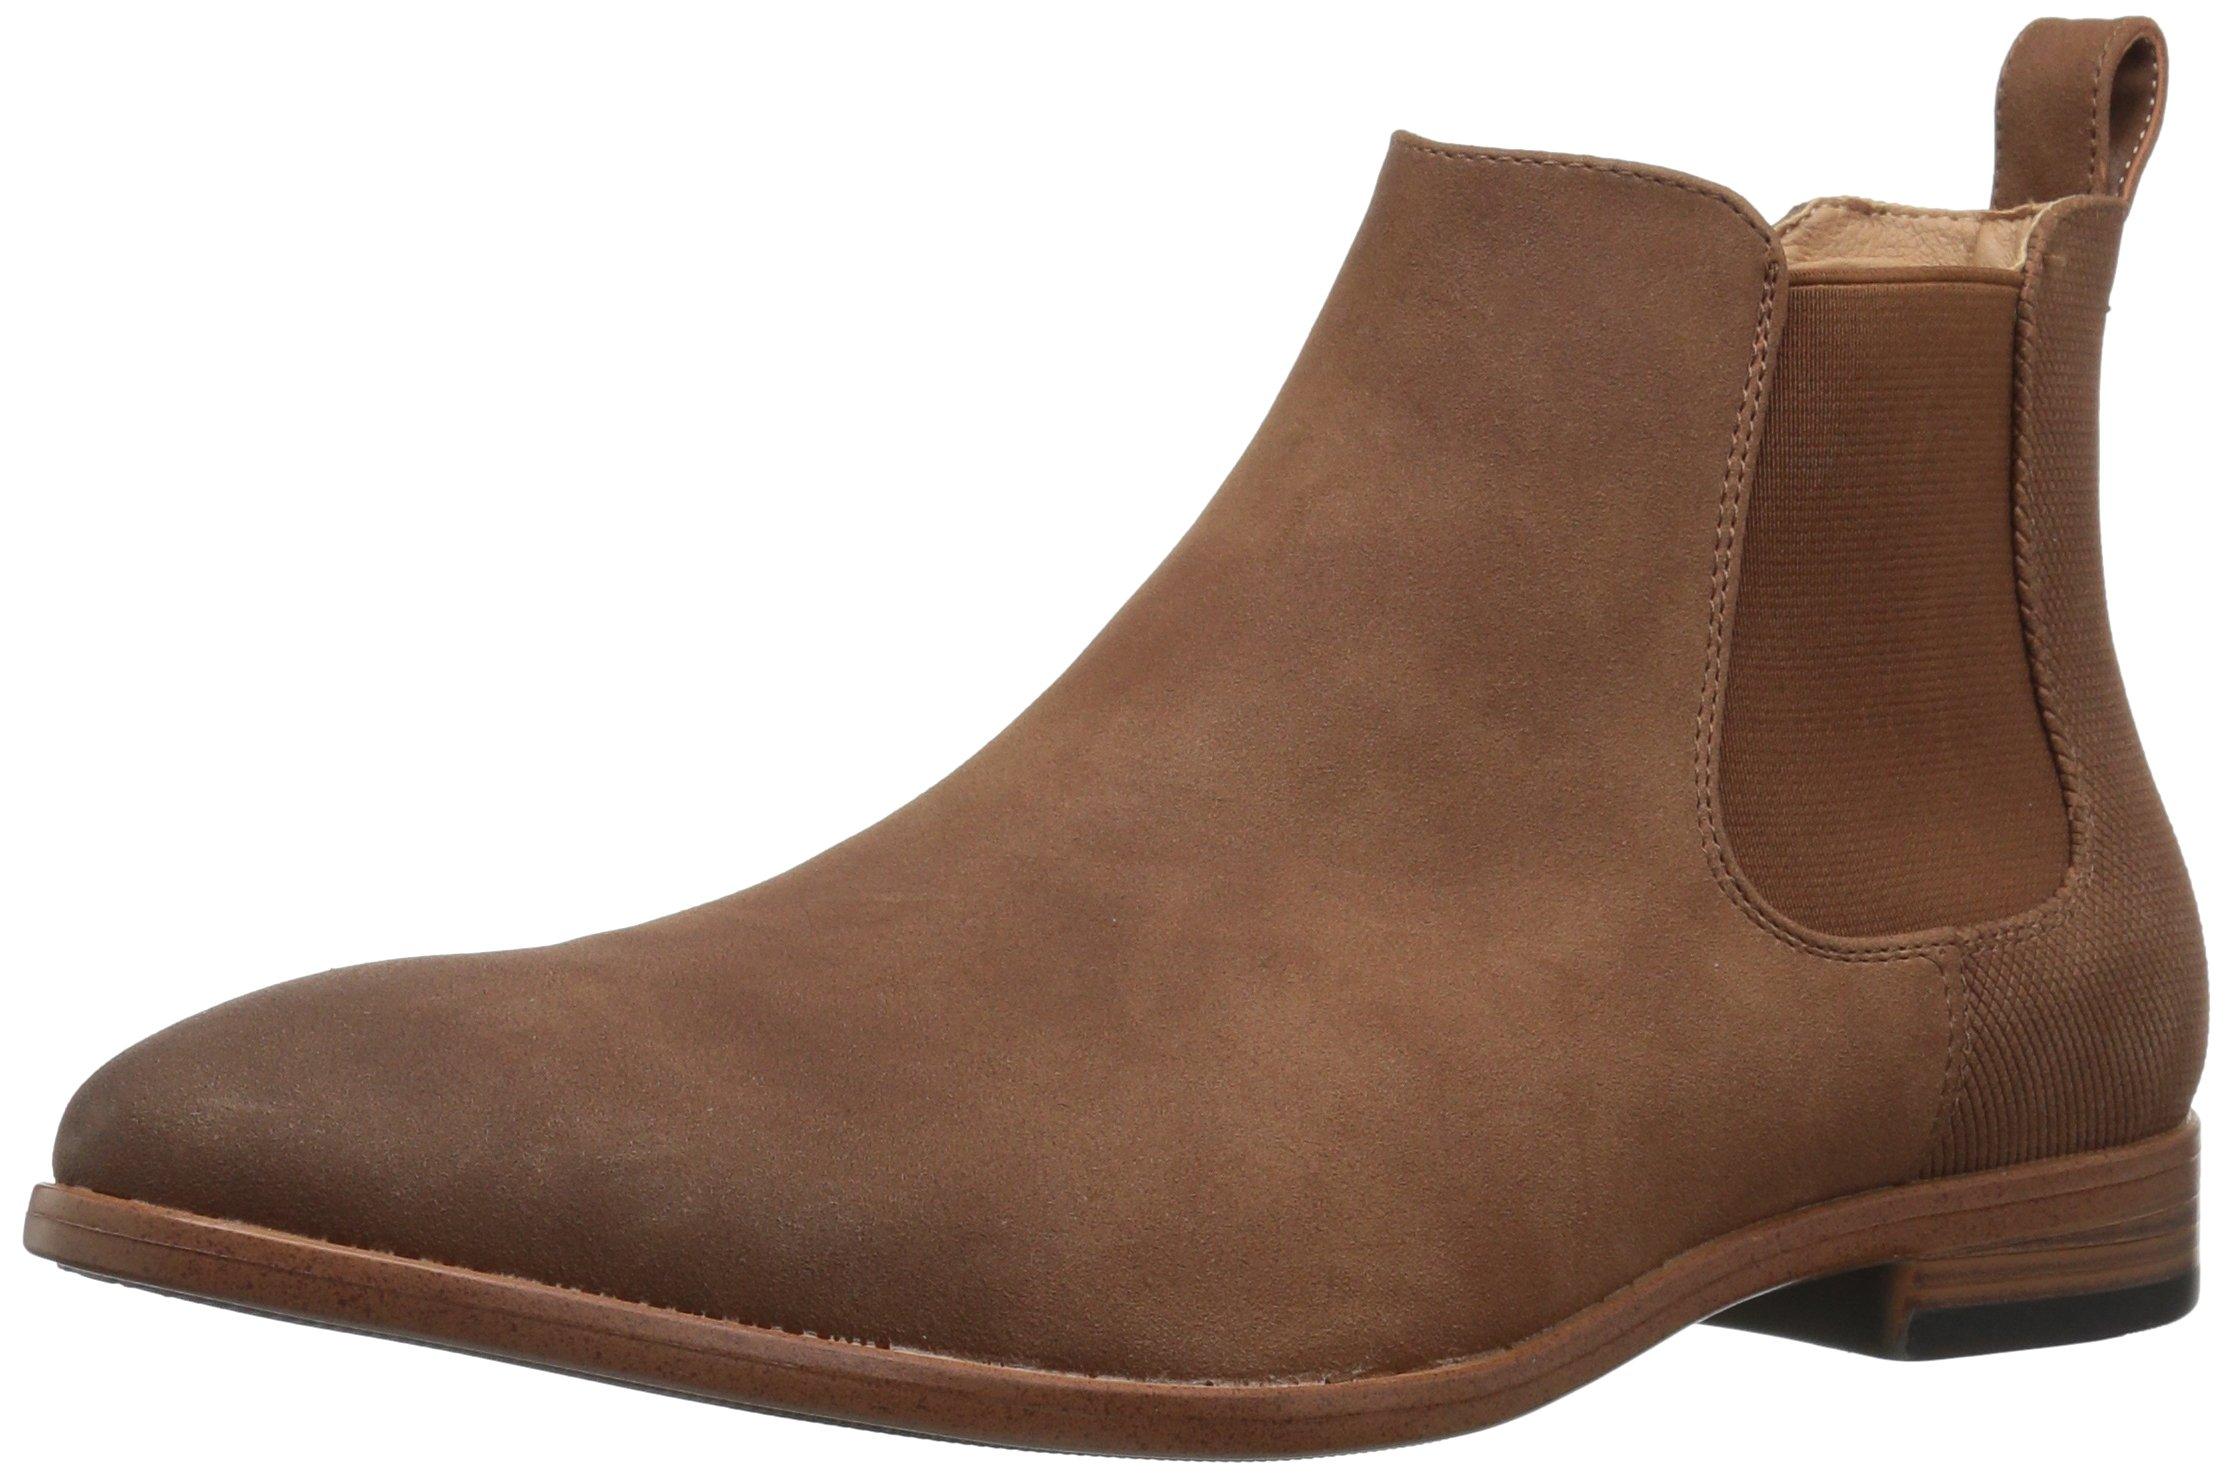 Madden Men's M-Grasp Chelsea Boot, Cognac Suede, 10.5 M US